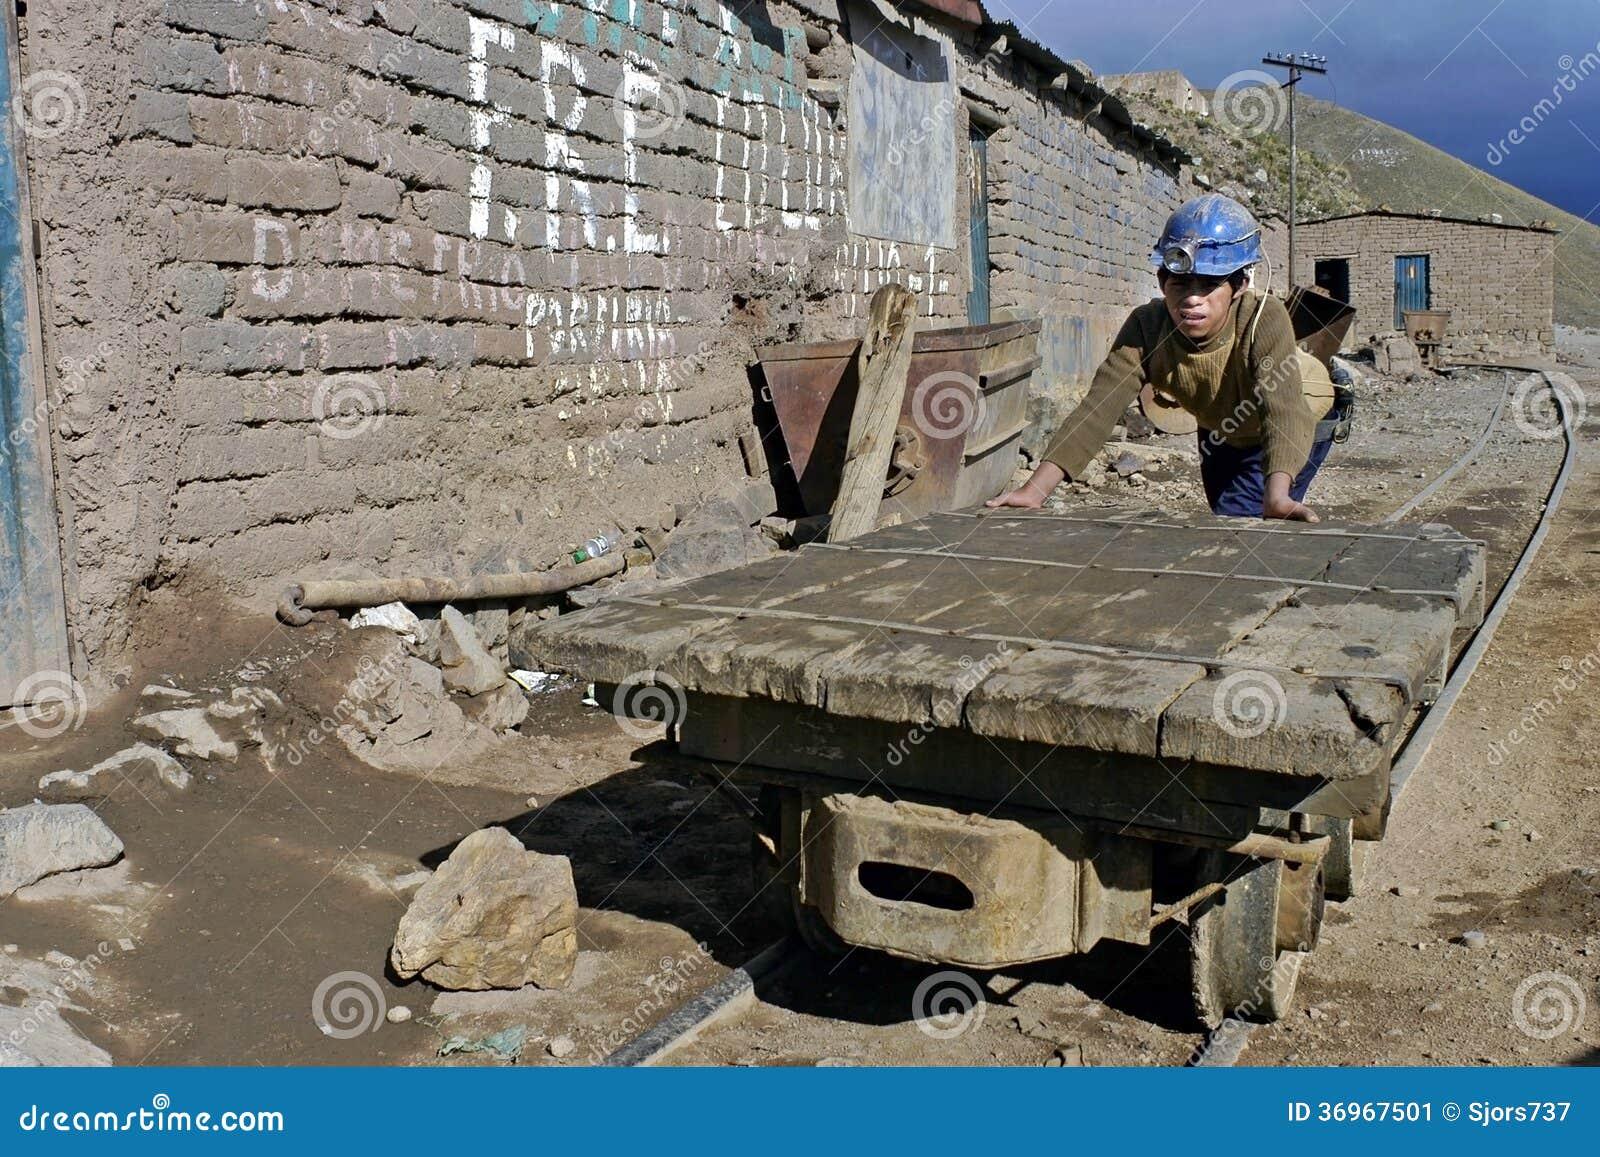 Child labor in a mine working Bolivian boy